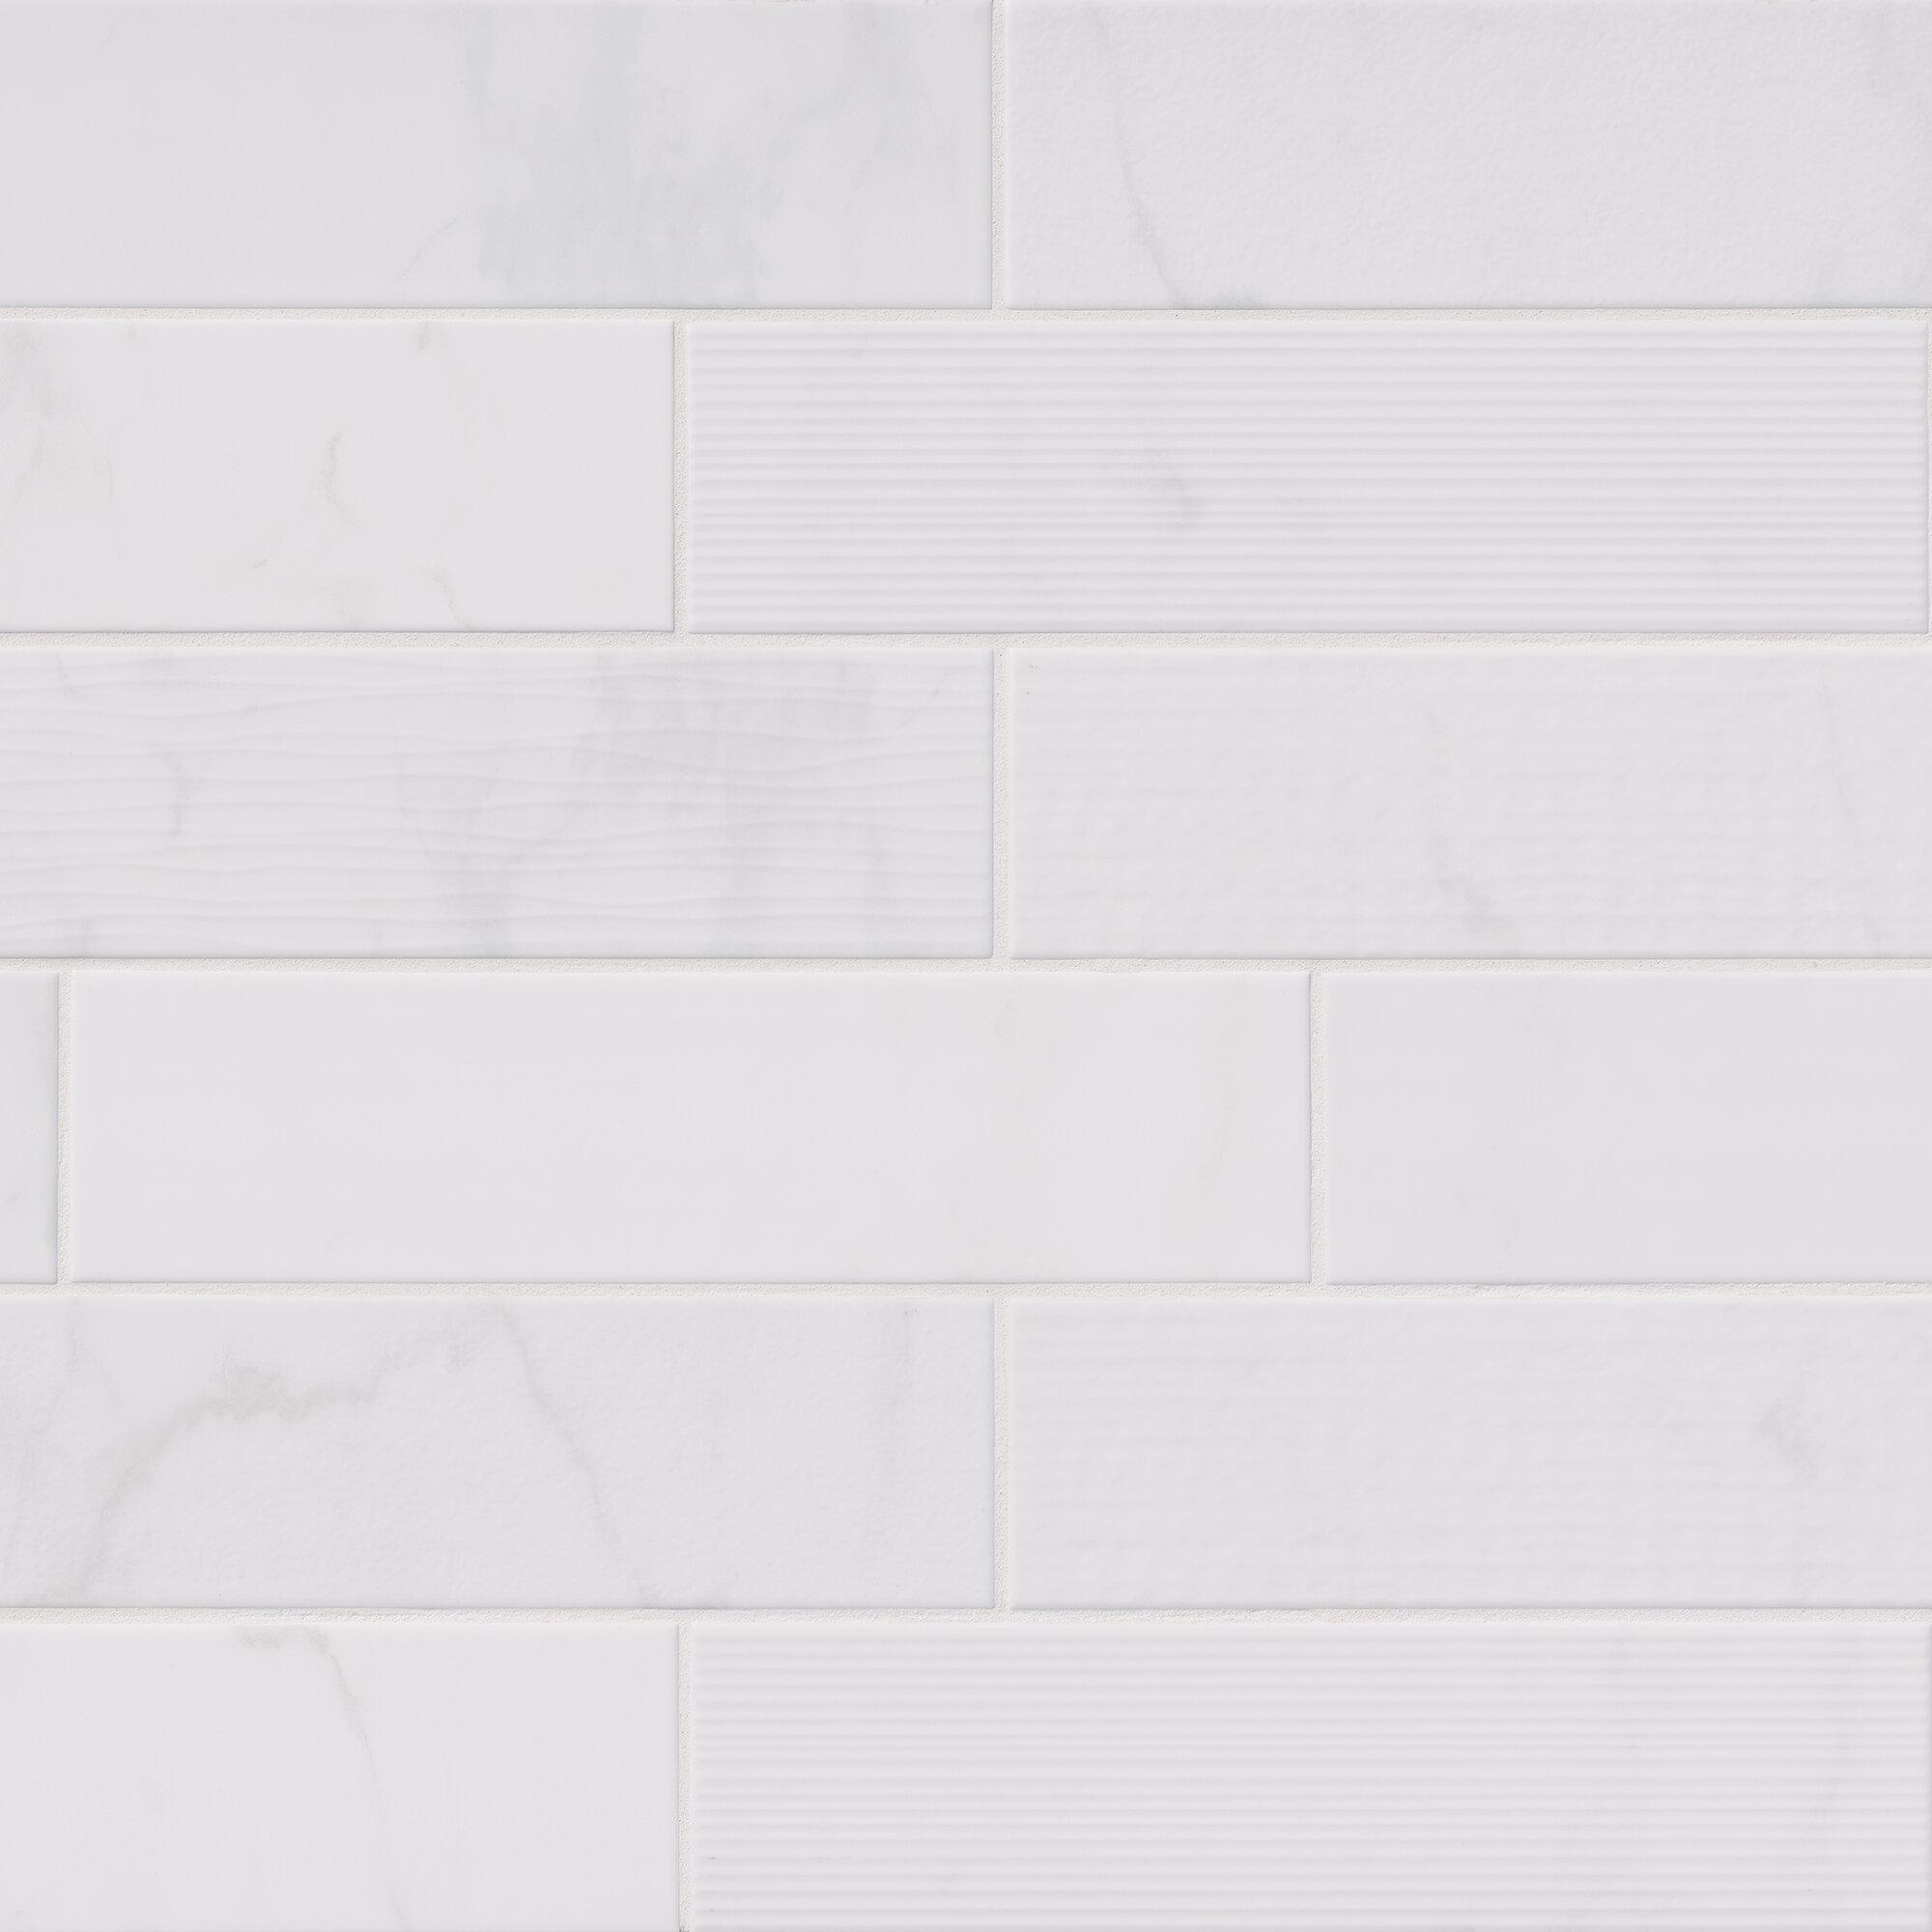 MSI Classique Mix X Ceramic Field Tile In White Reviews - 16 x 16 white ceramic floor tile